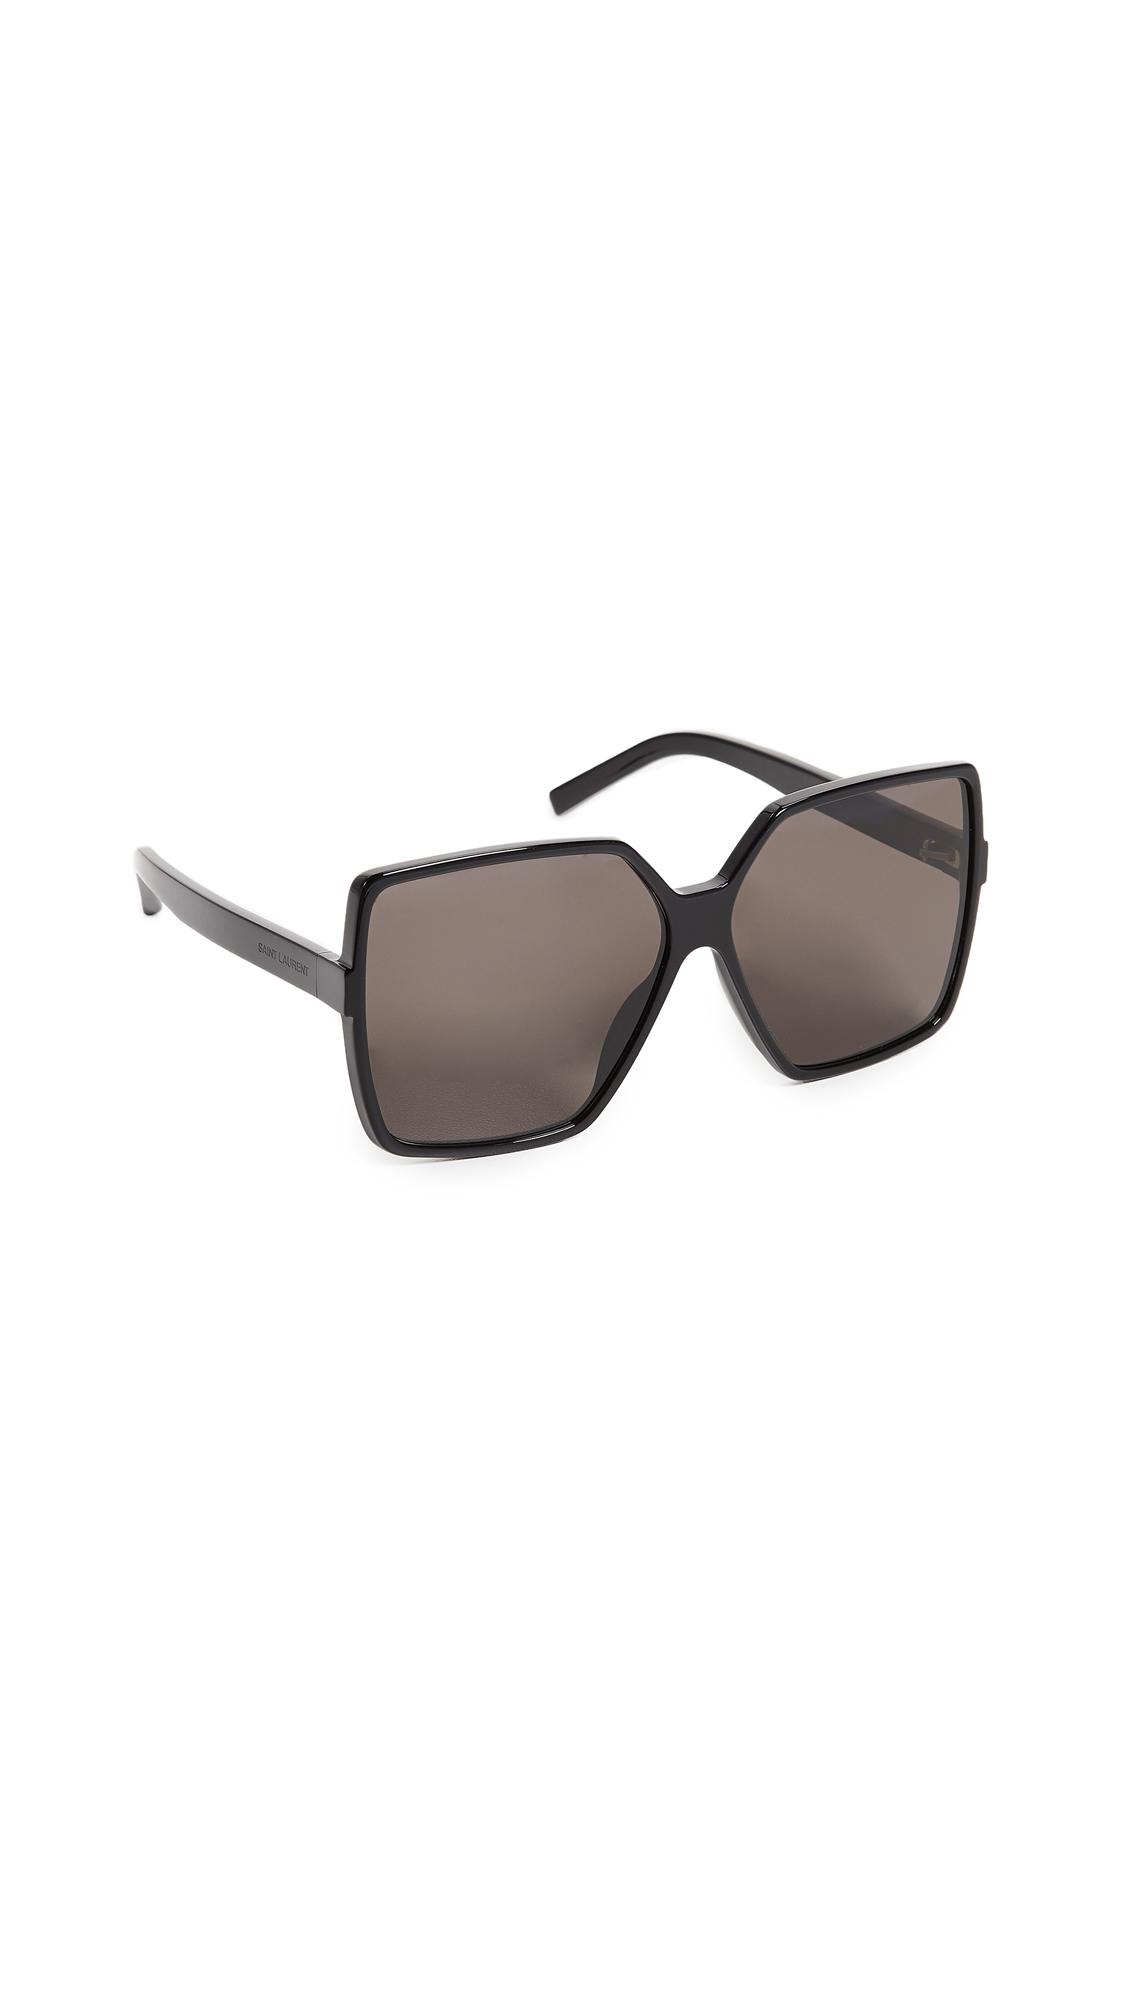 Sl 232 Betty Sunglasses, Black/Solid Grey